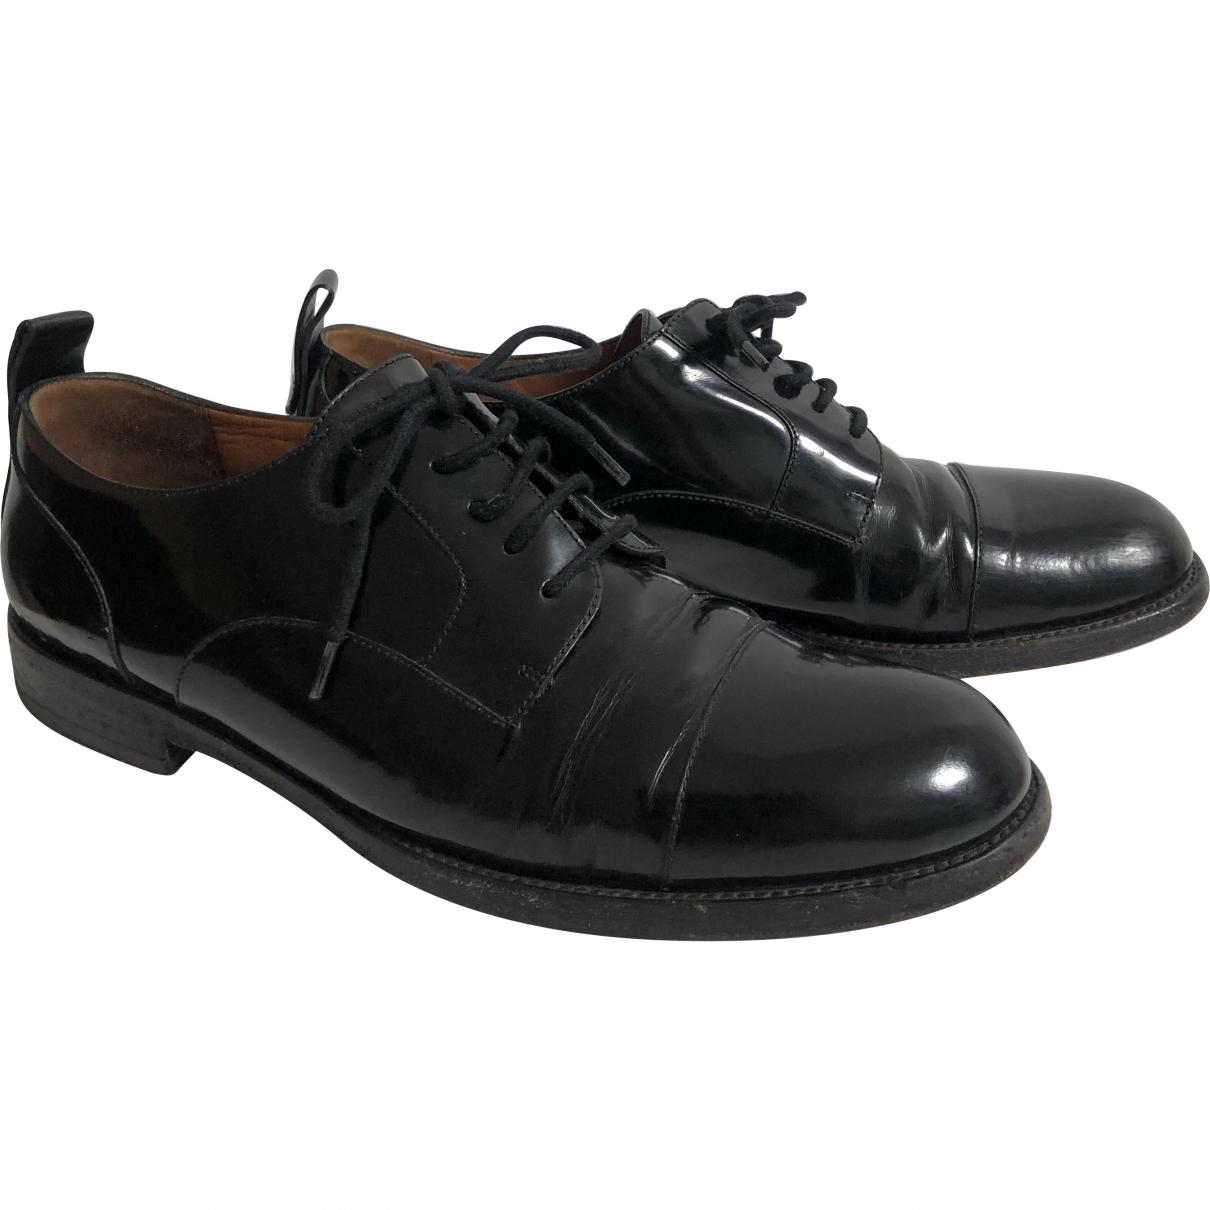 Valentino Garavani \N Black Patent leather Lace ups for Women 39 EU